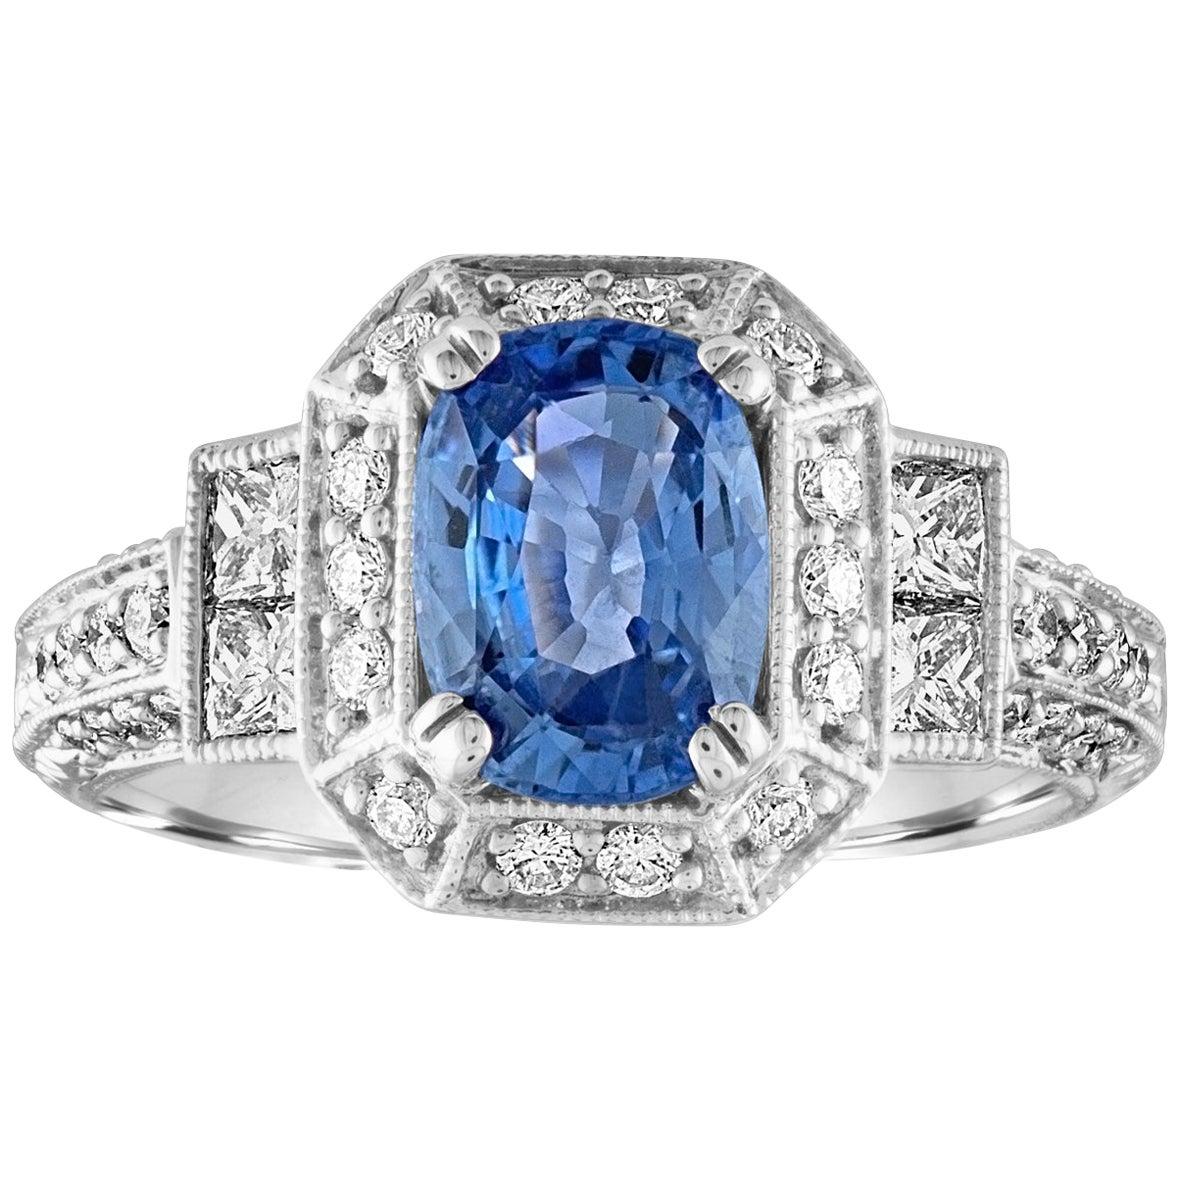 1.74 Carat Blue Sapphire Oval Diamond Gold Milgrain Filigree Ring